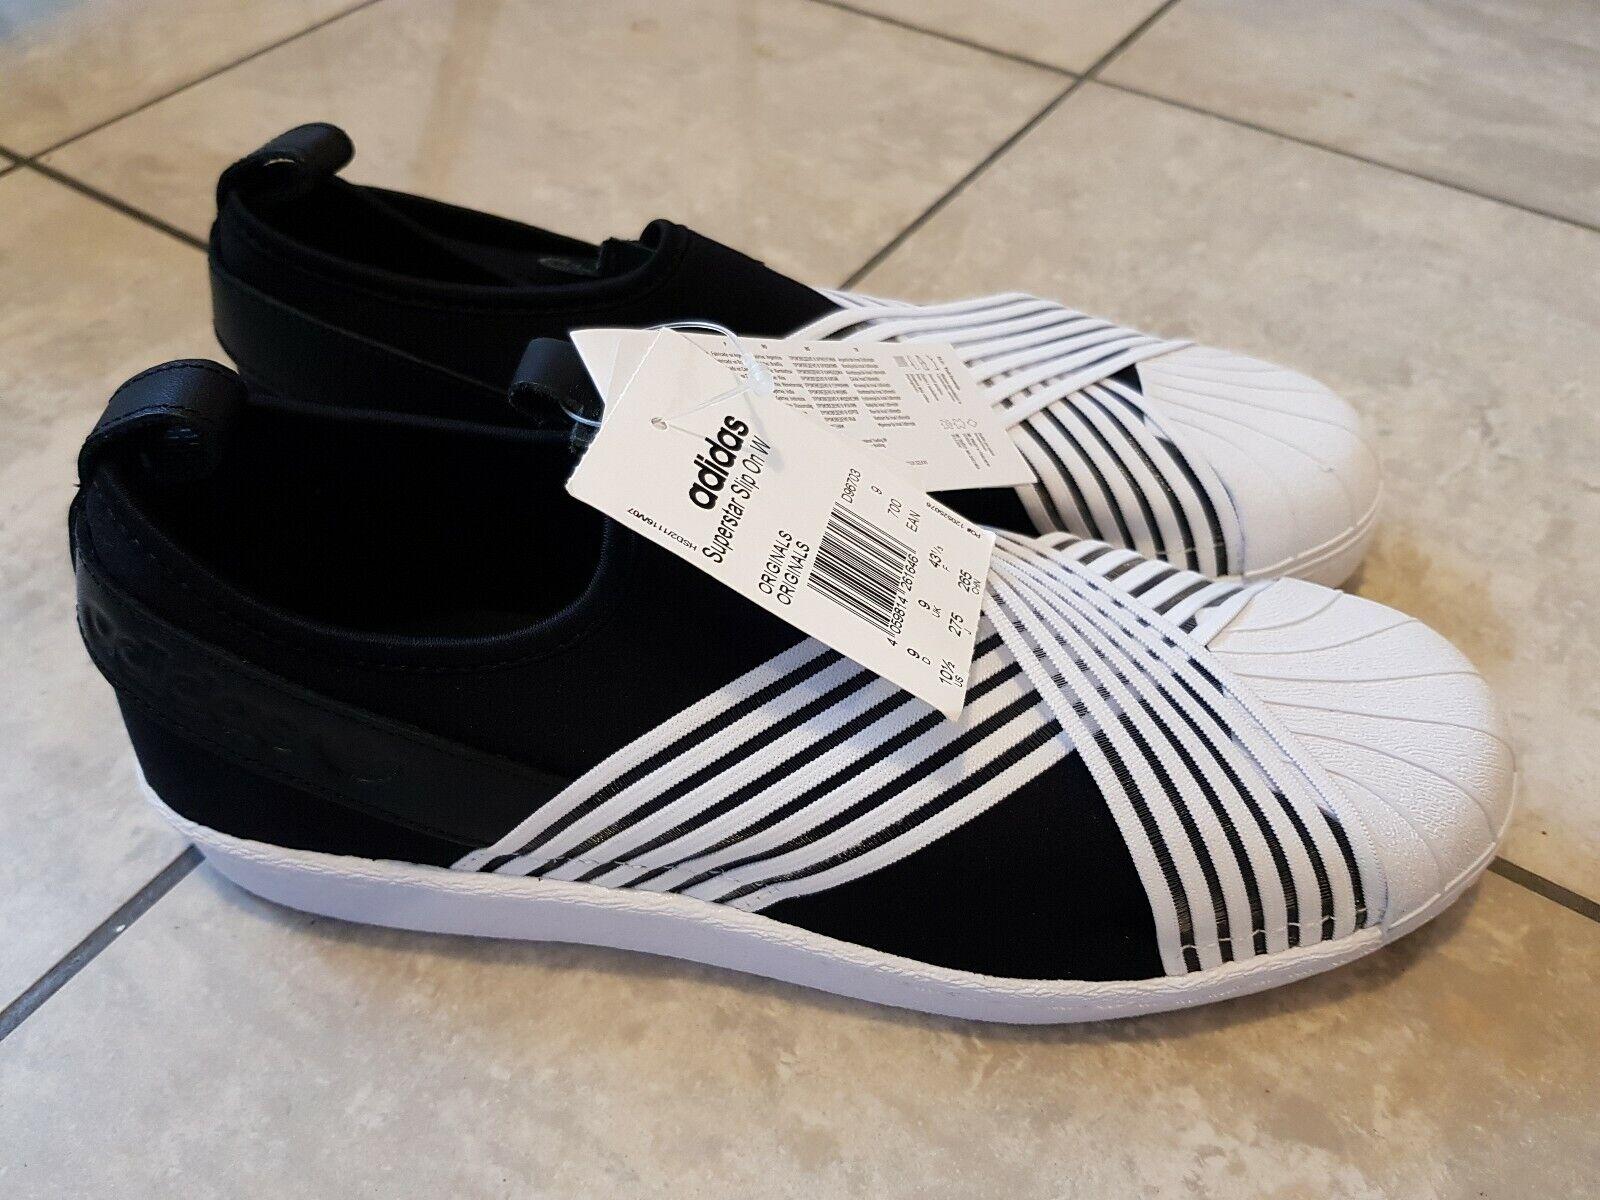 Originals Adidas Superstar Slip On W  Gr. 43 1 3 US 10.5 Turnschuhe Neu